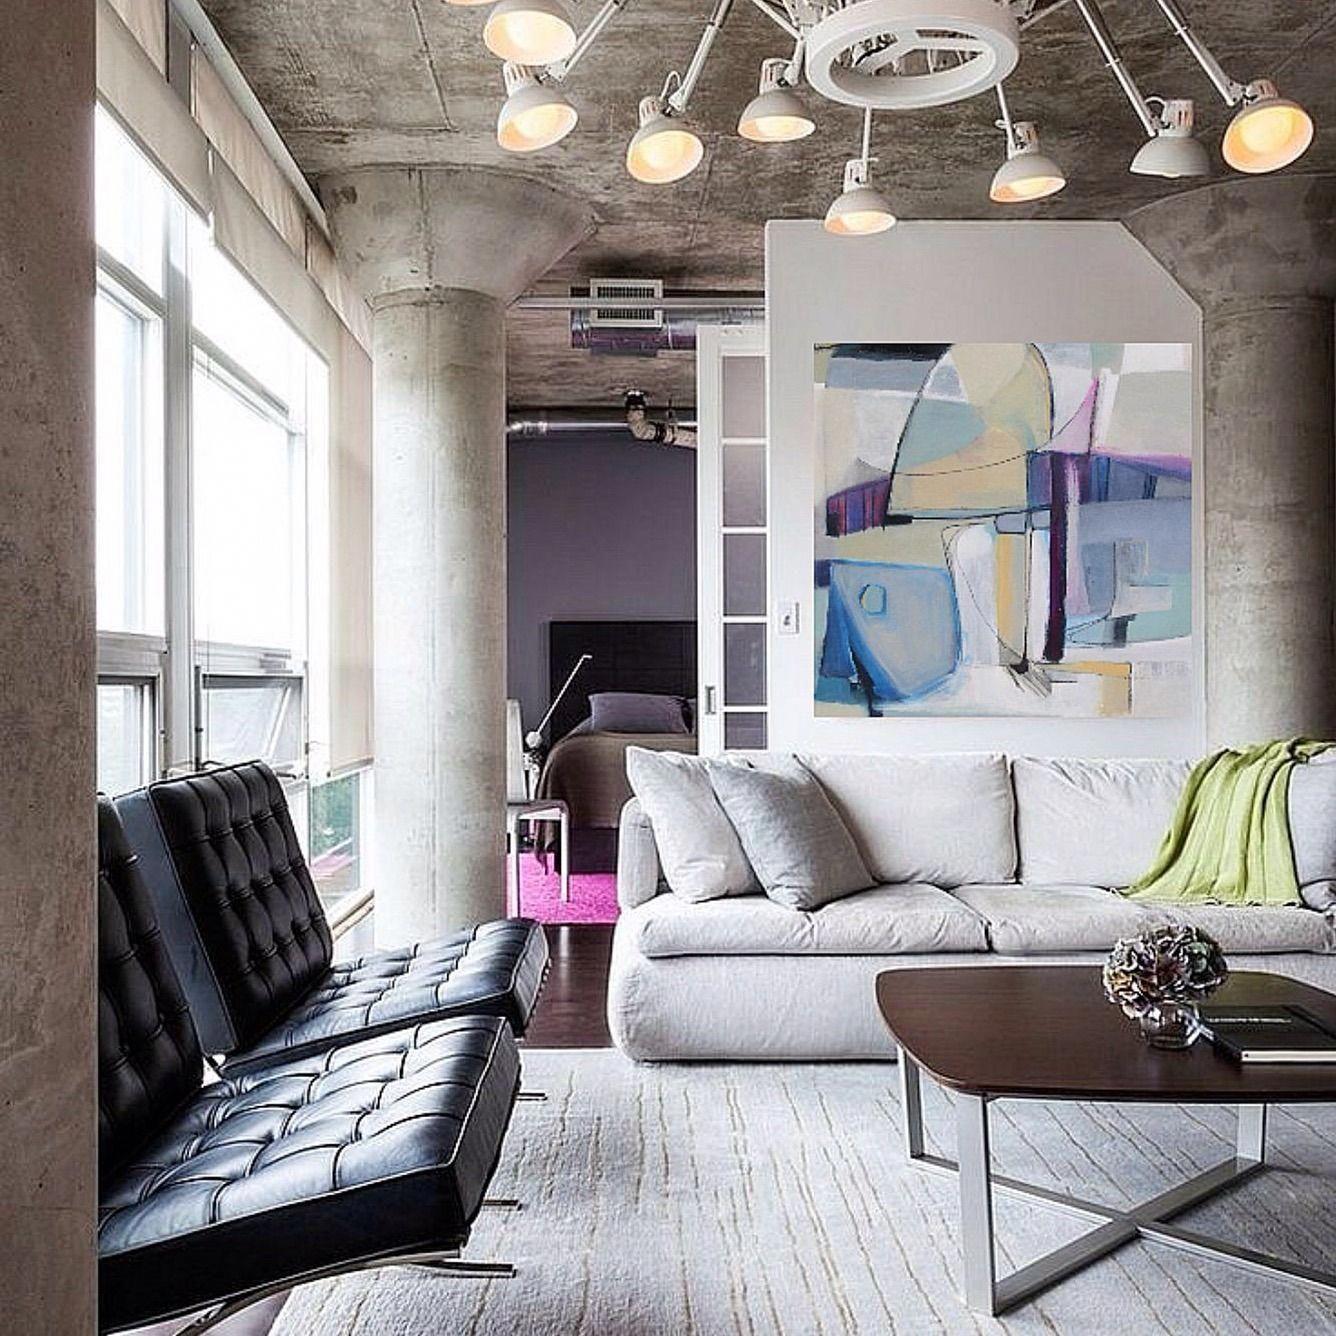 10 Fascinating Interior Painting Sherwin Williams Ideas Interior Interior Design Interior Paint